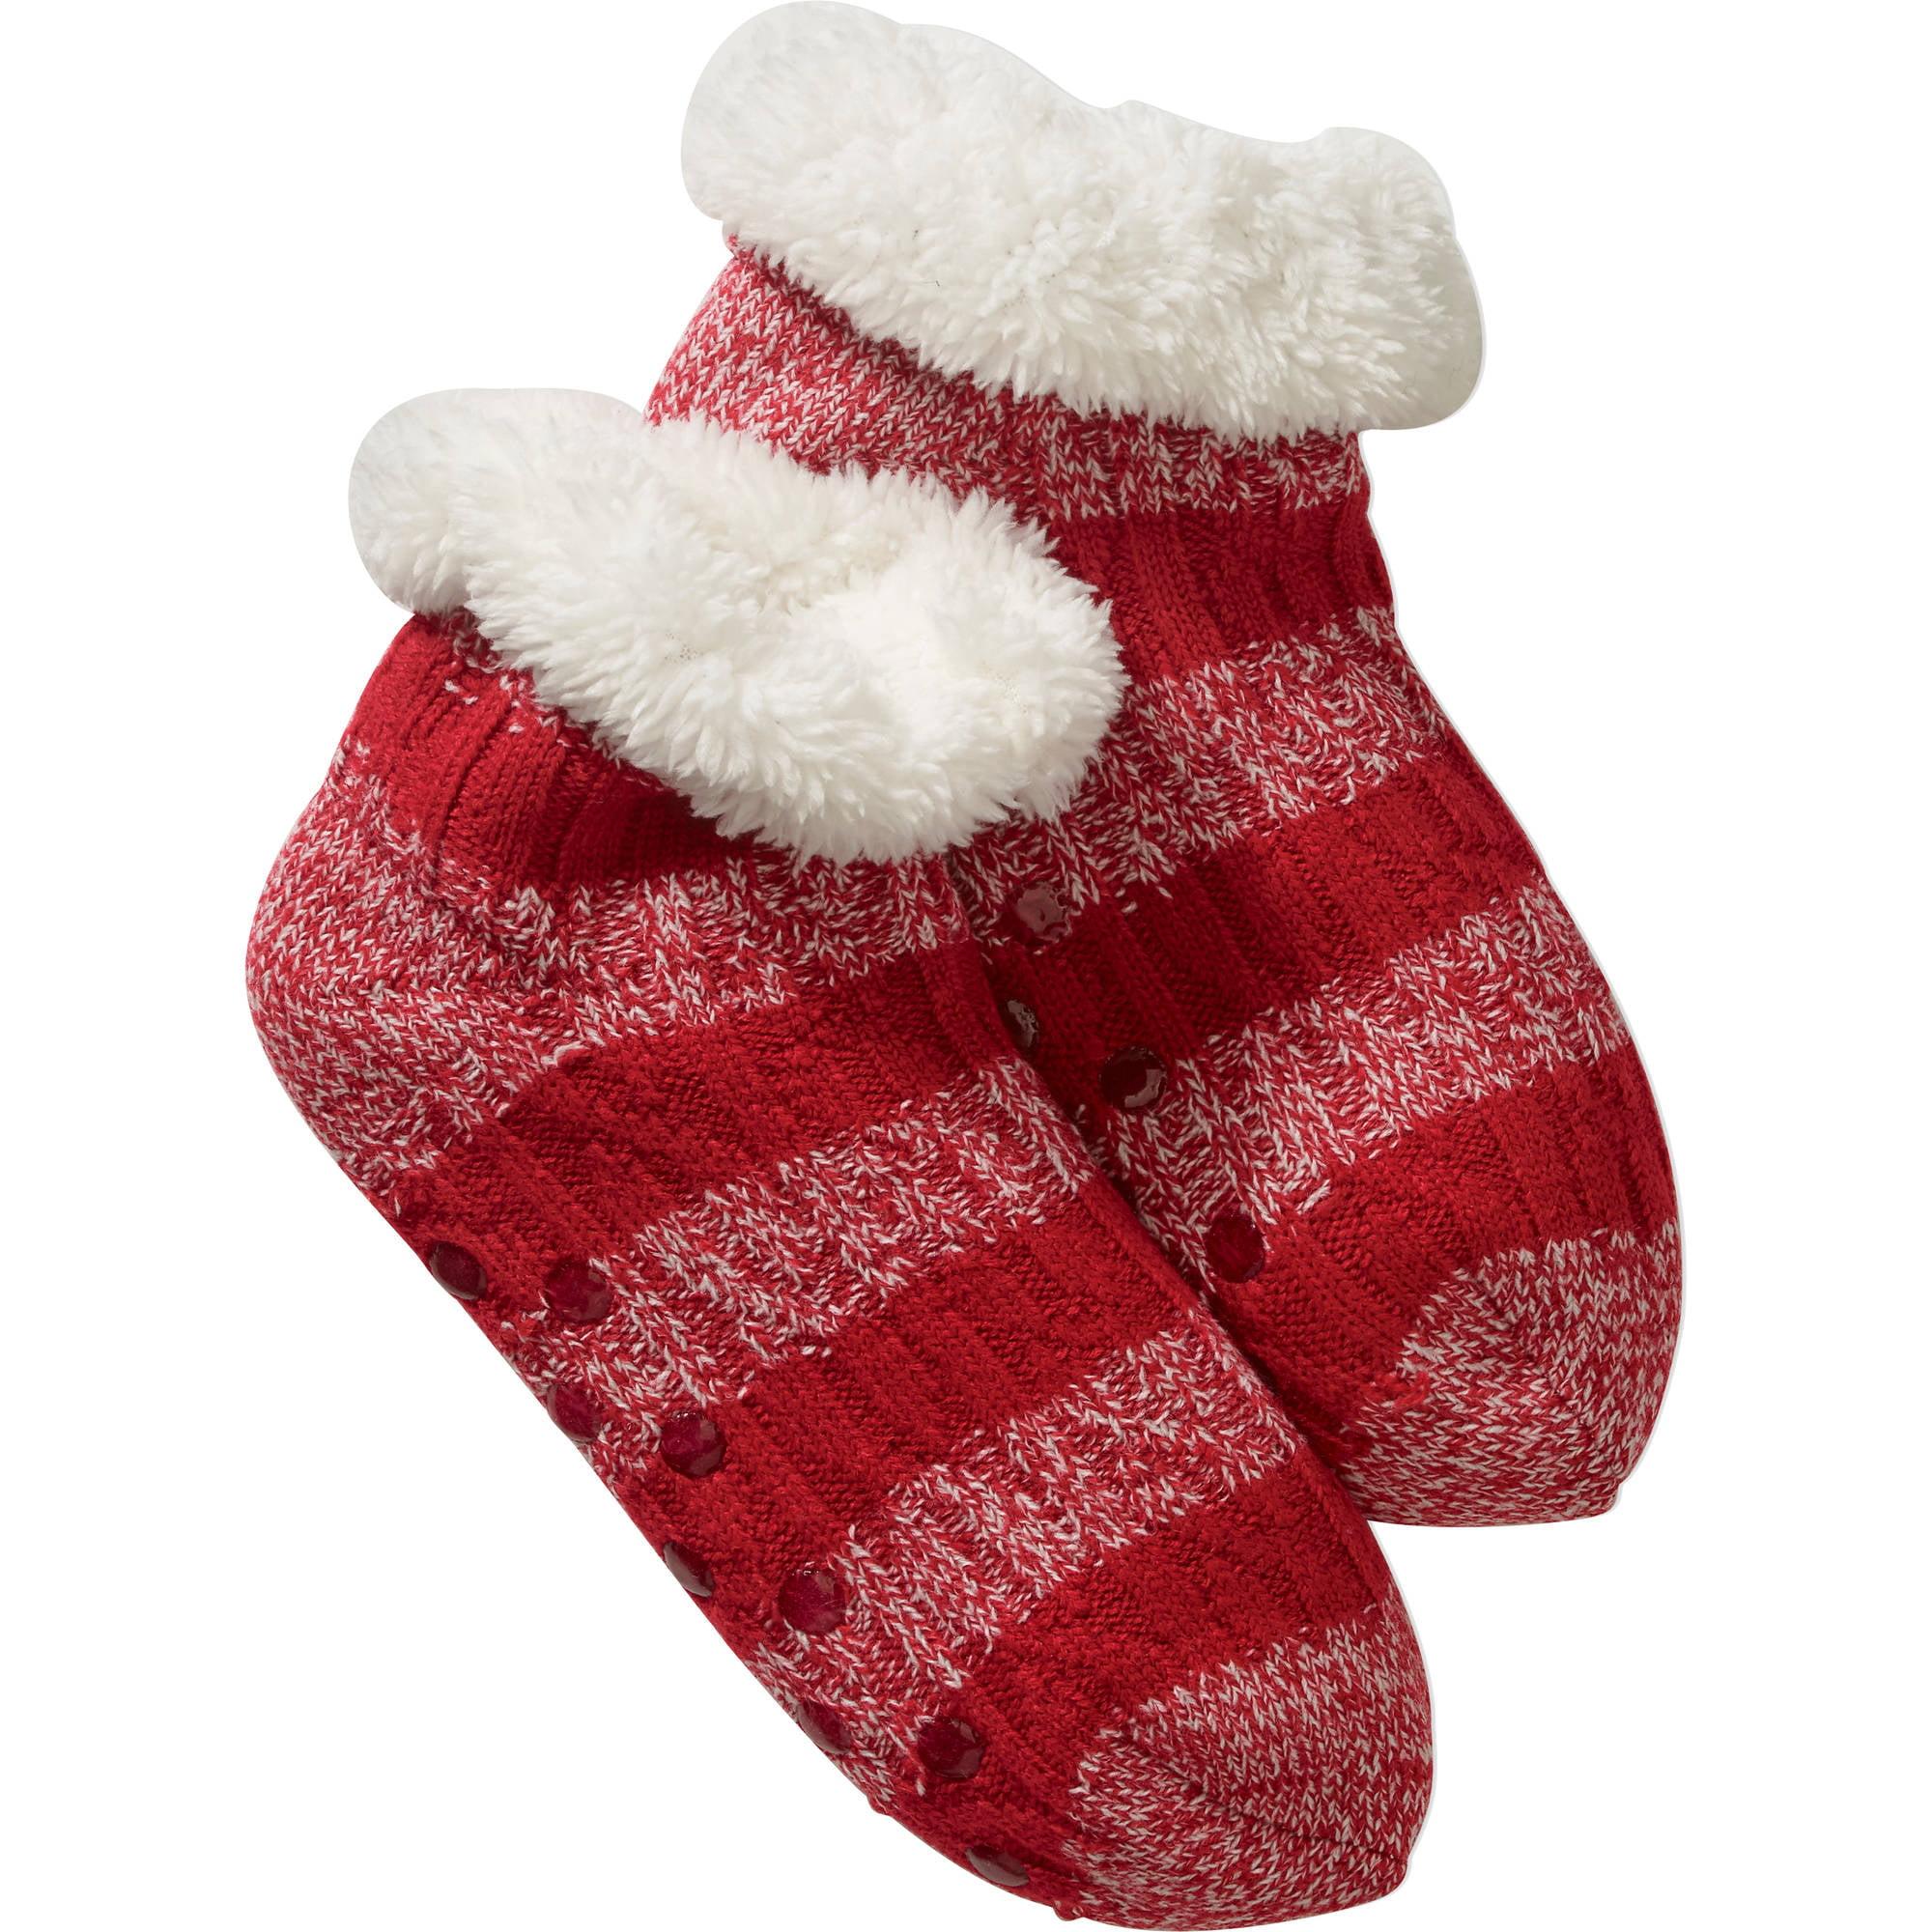 Cozy Warmer Cable Knit Striped Slipper Socks